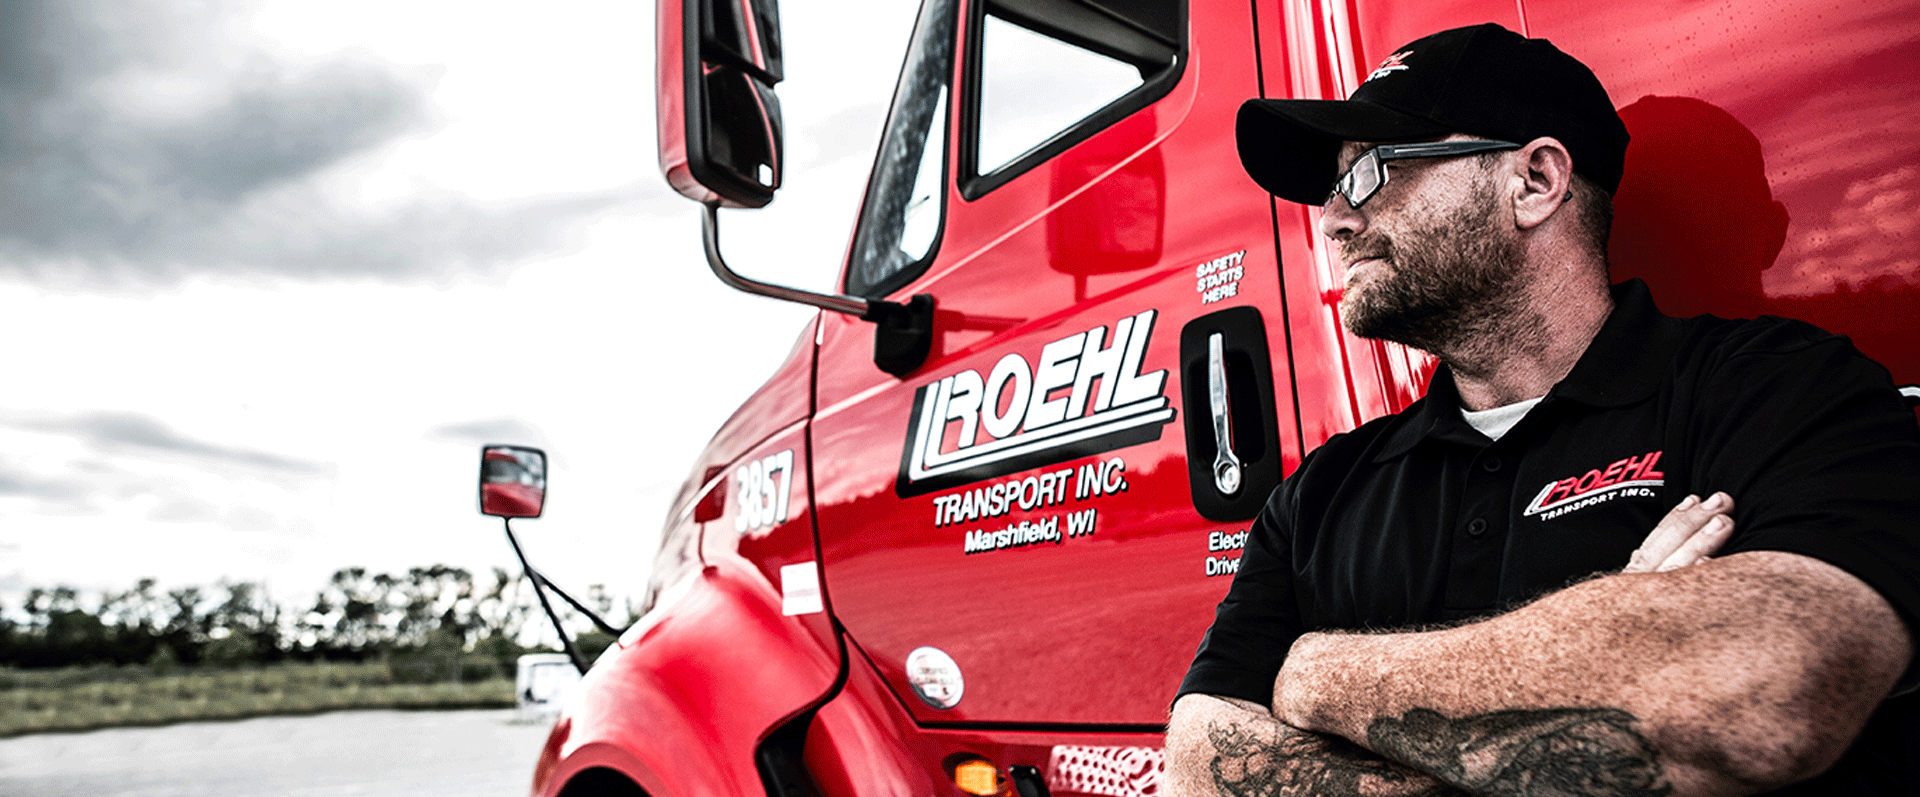 roehl transport truck driving jobs  u0026 cdl training